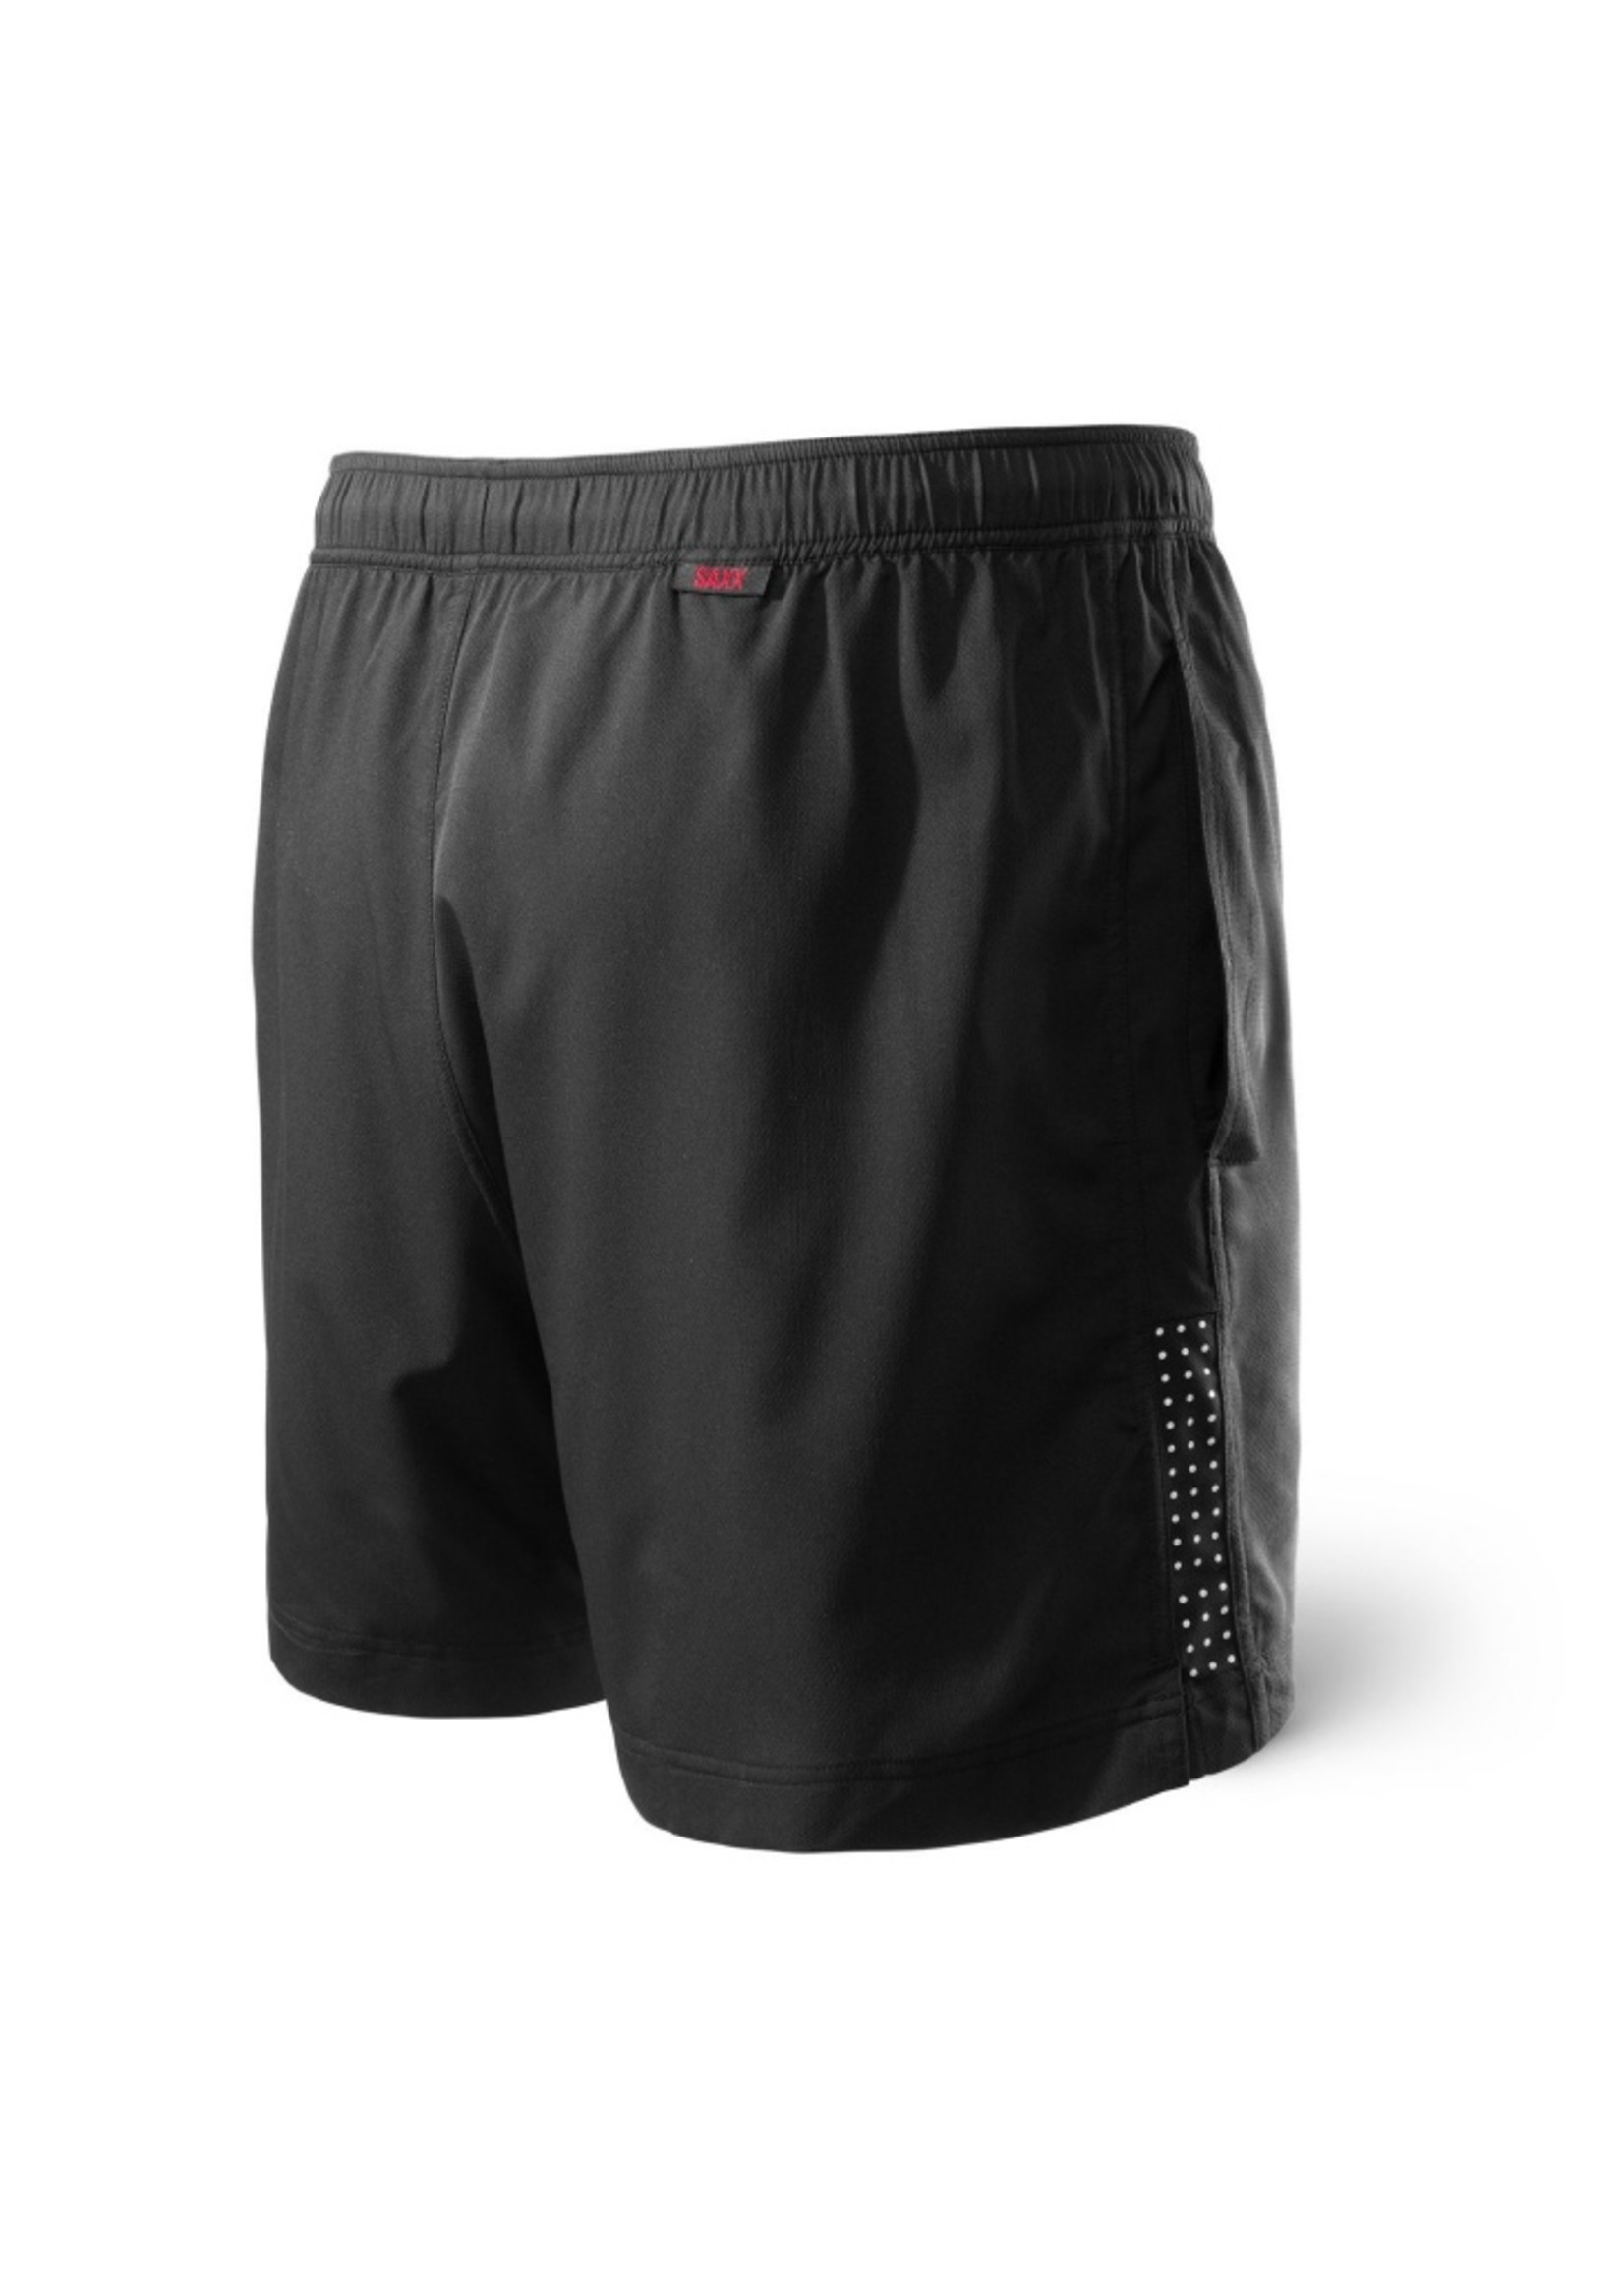 Saxx Kinetic 2N1 Run Shorts